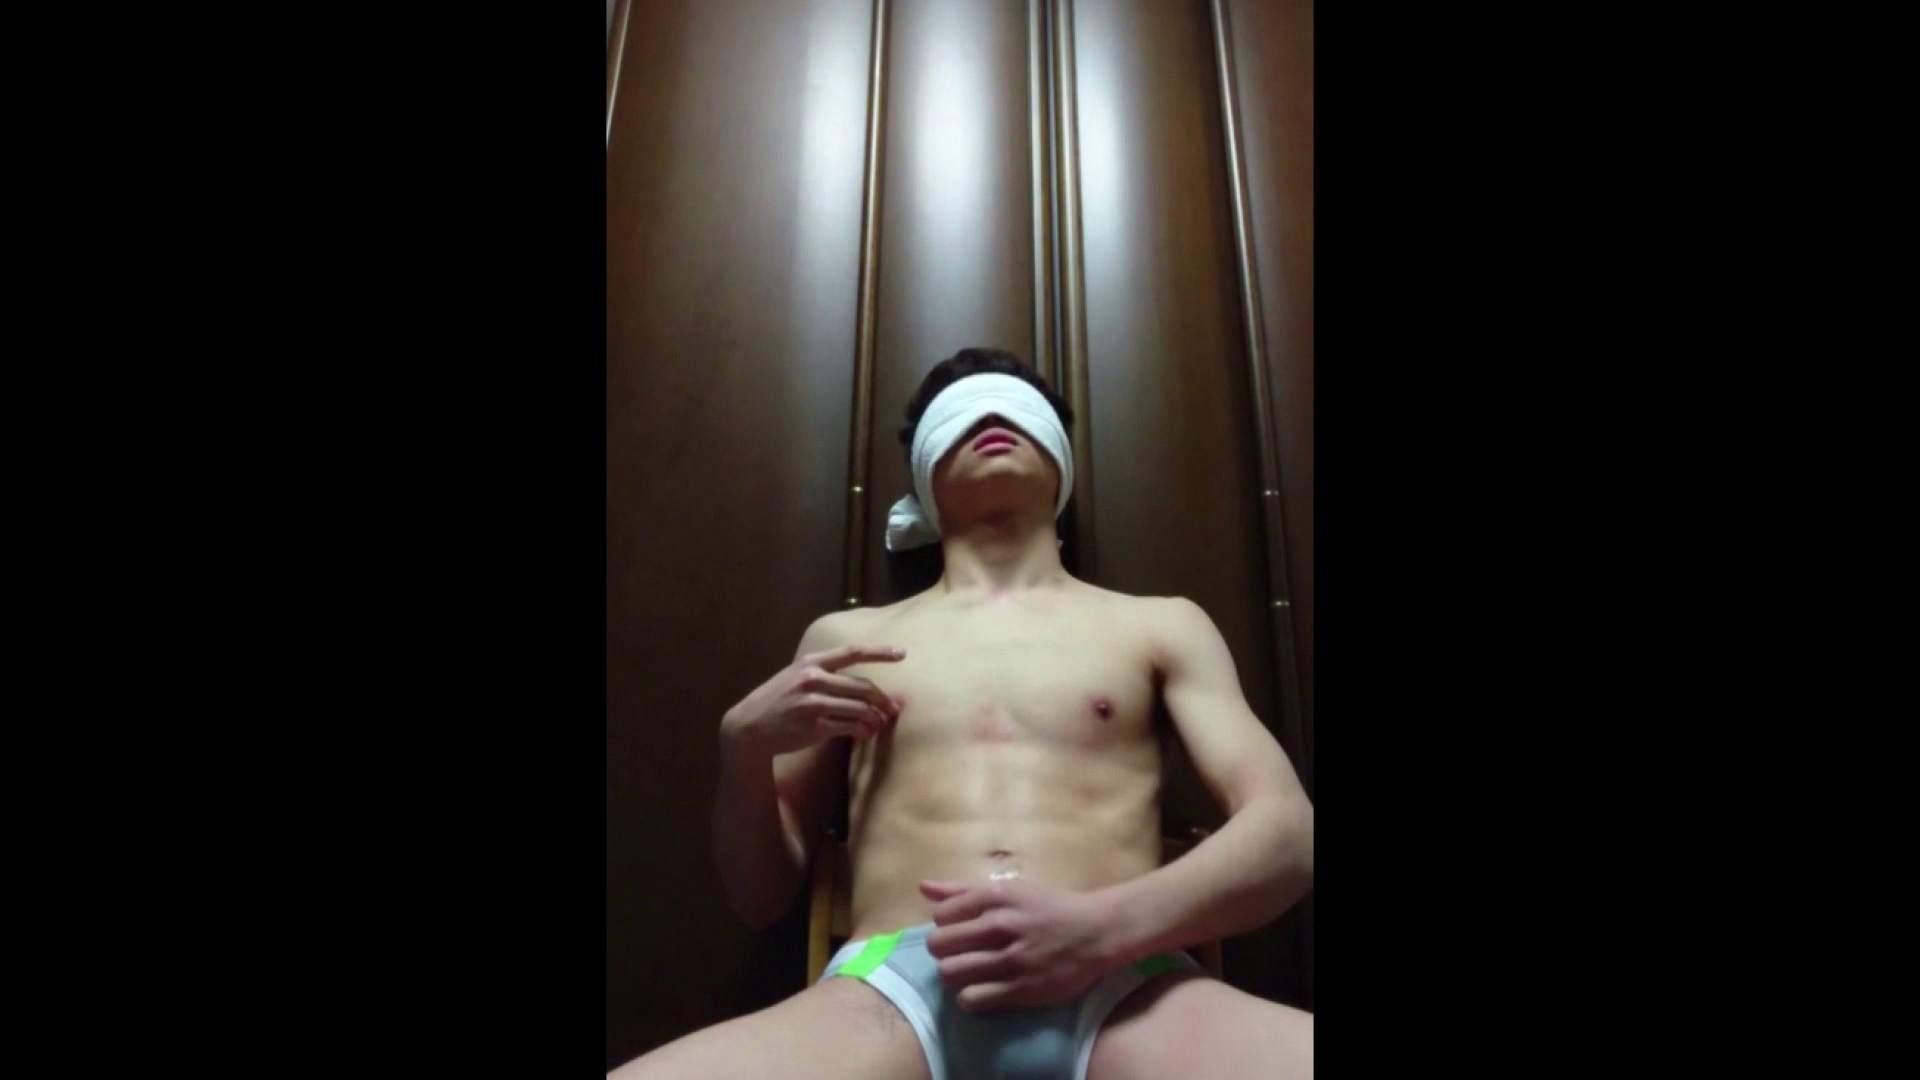 個人撮影 自慰の極意 Vol.21 無修正 男同士動画 93pic 23